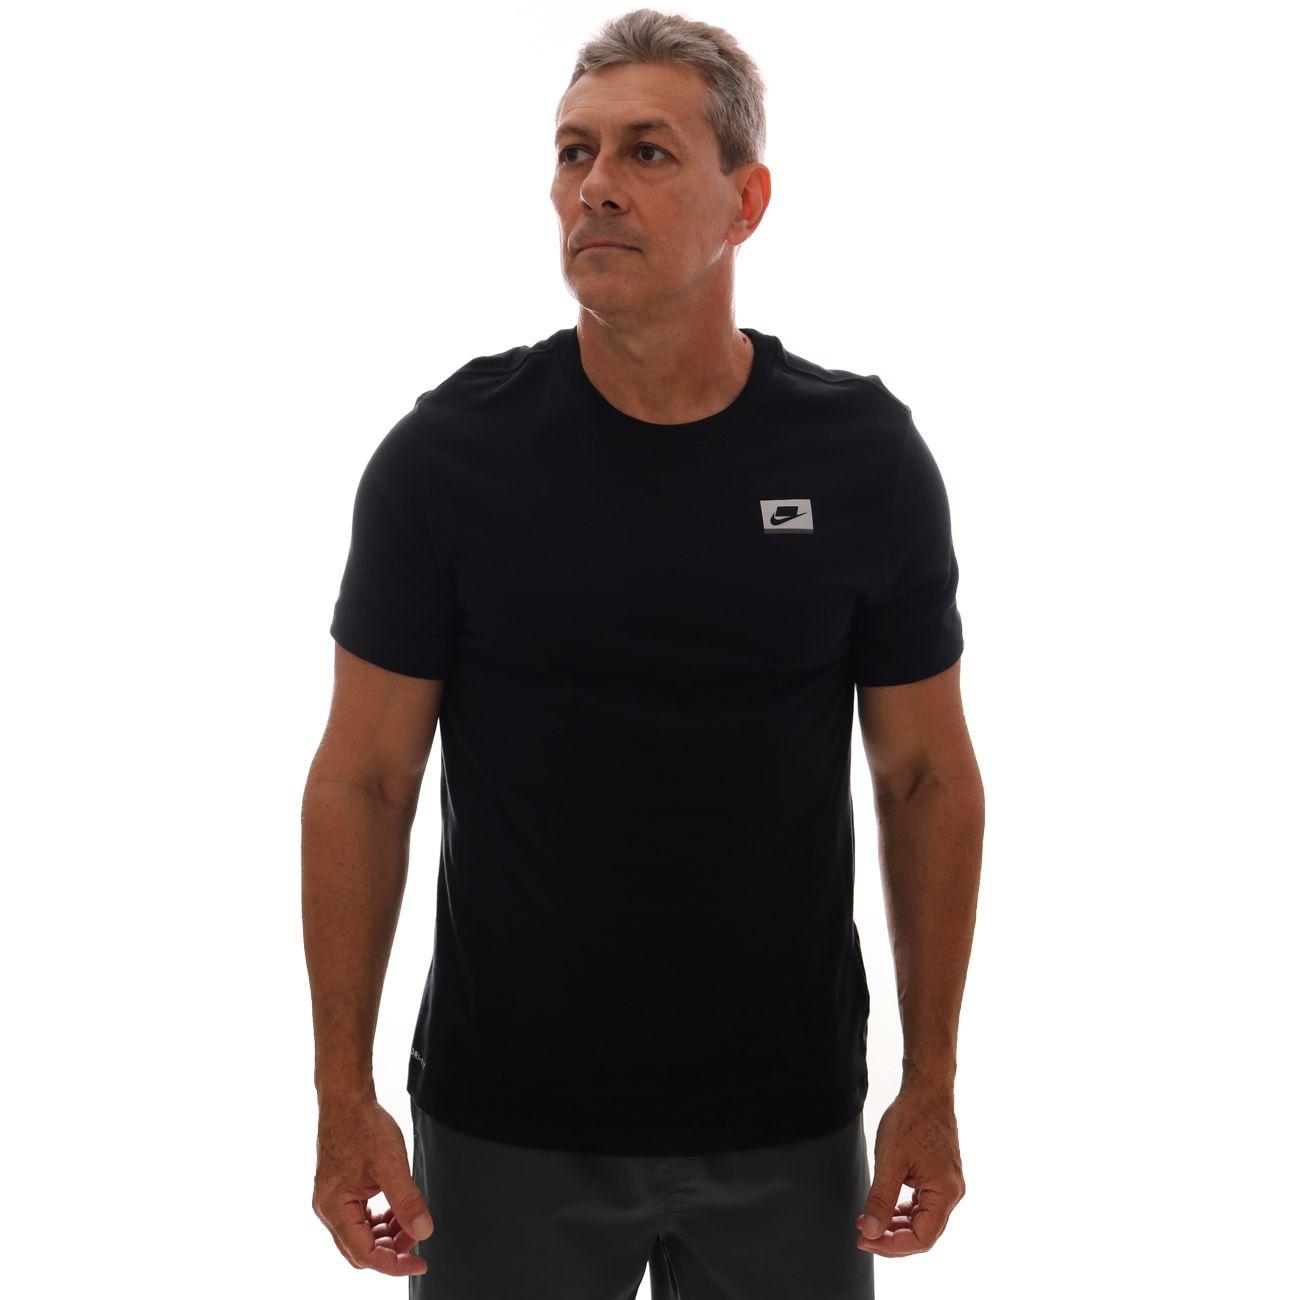 Camiseta Nike Dri-fit Tee Preto